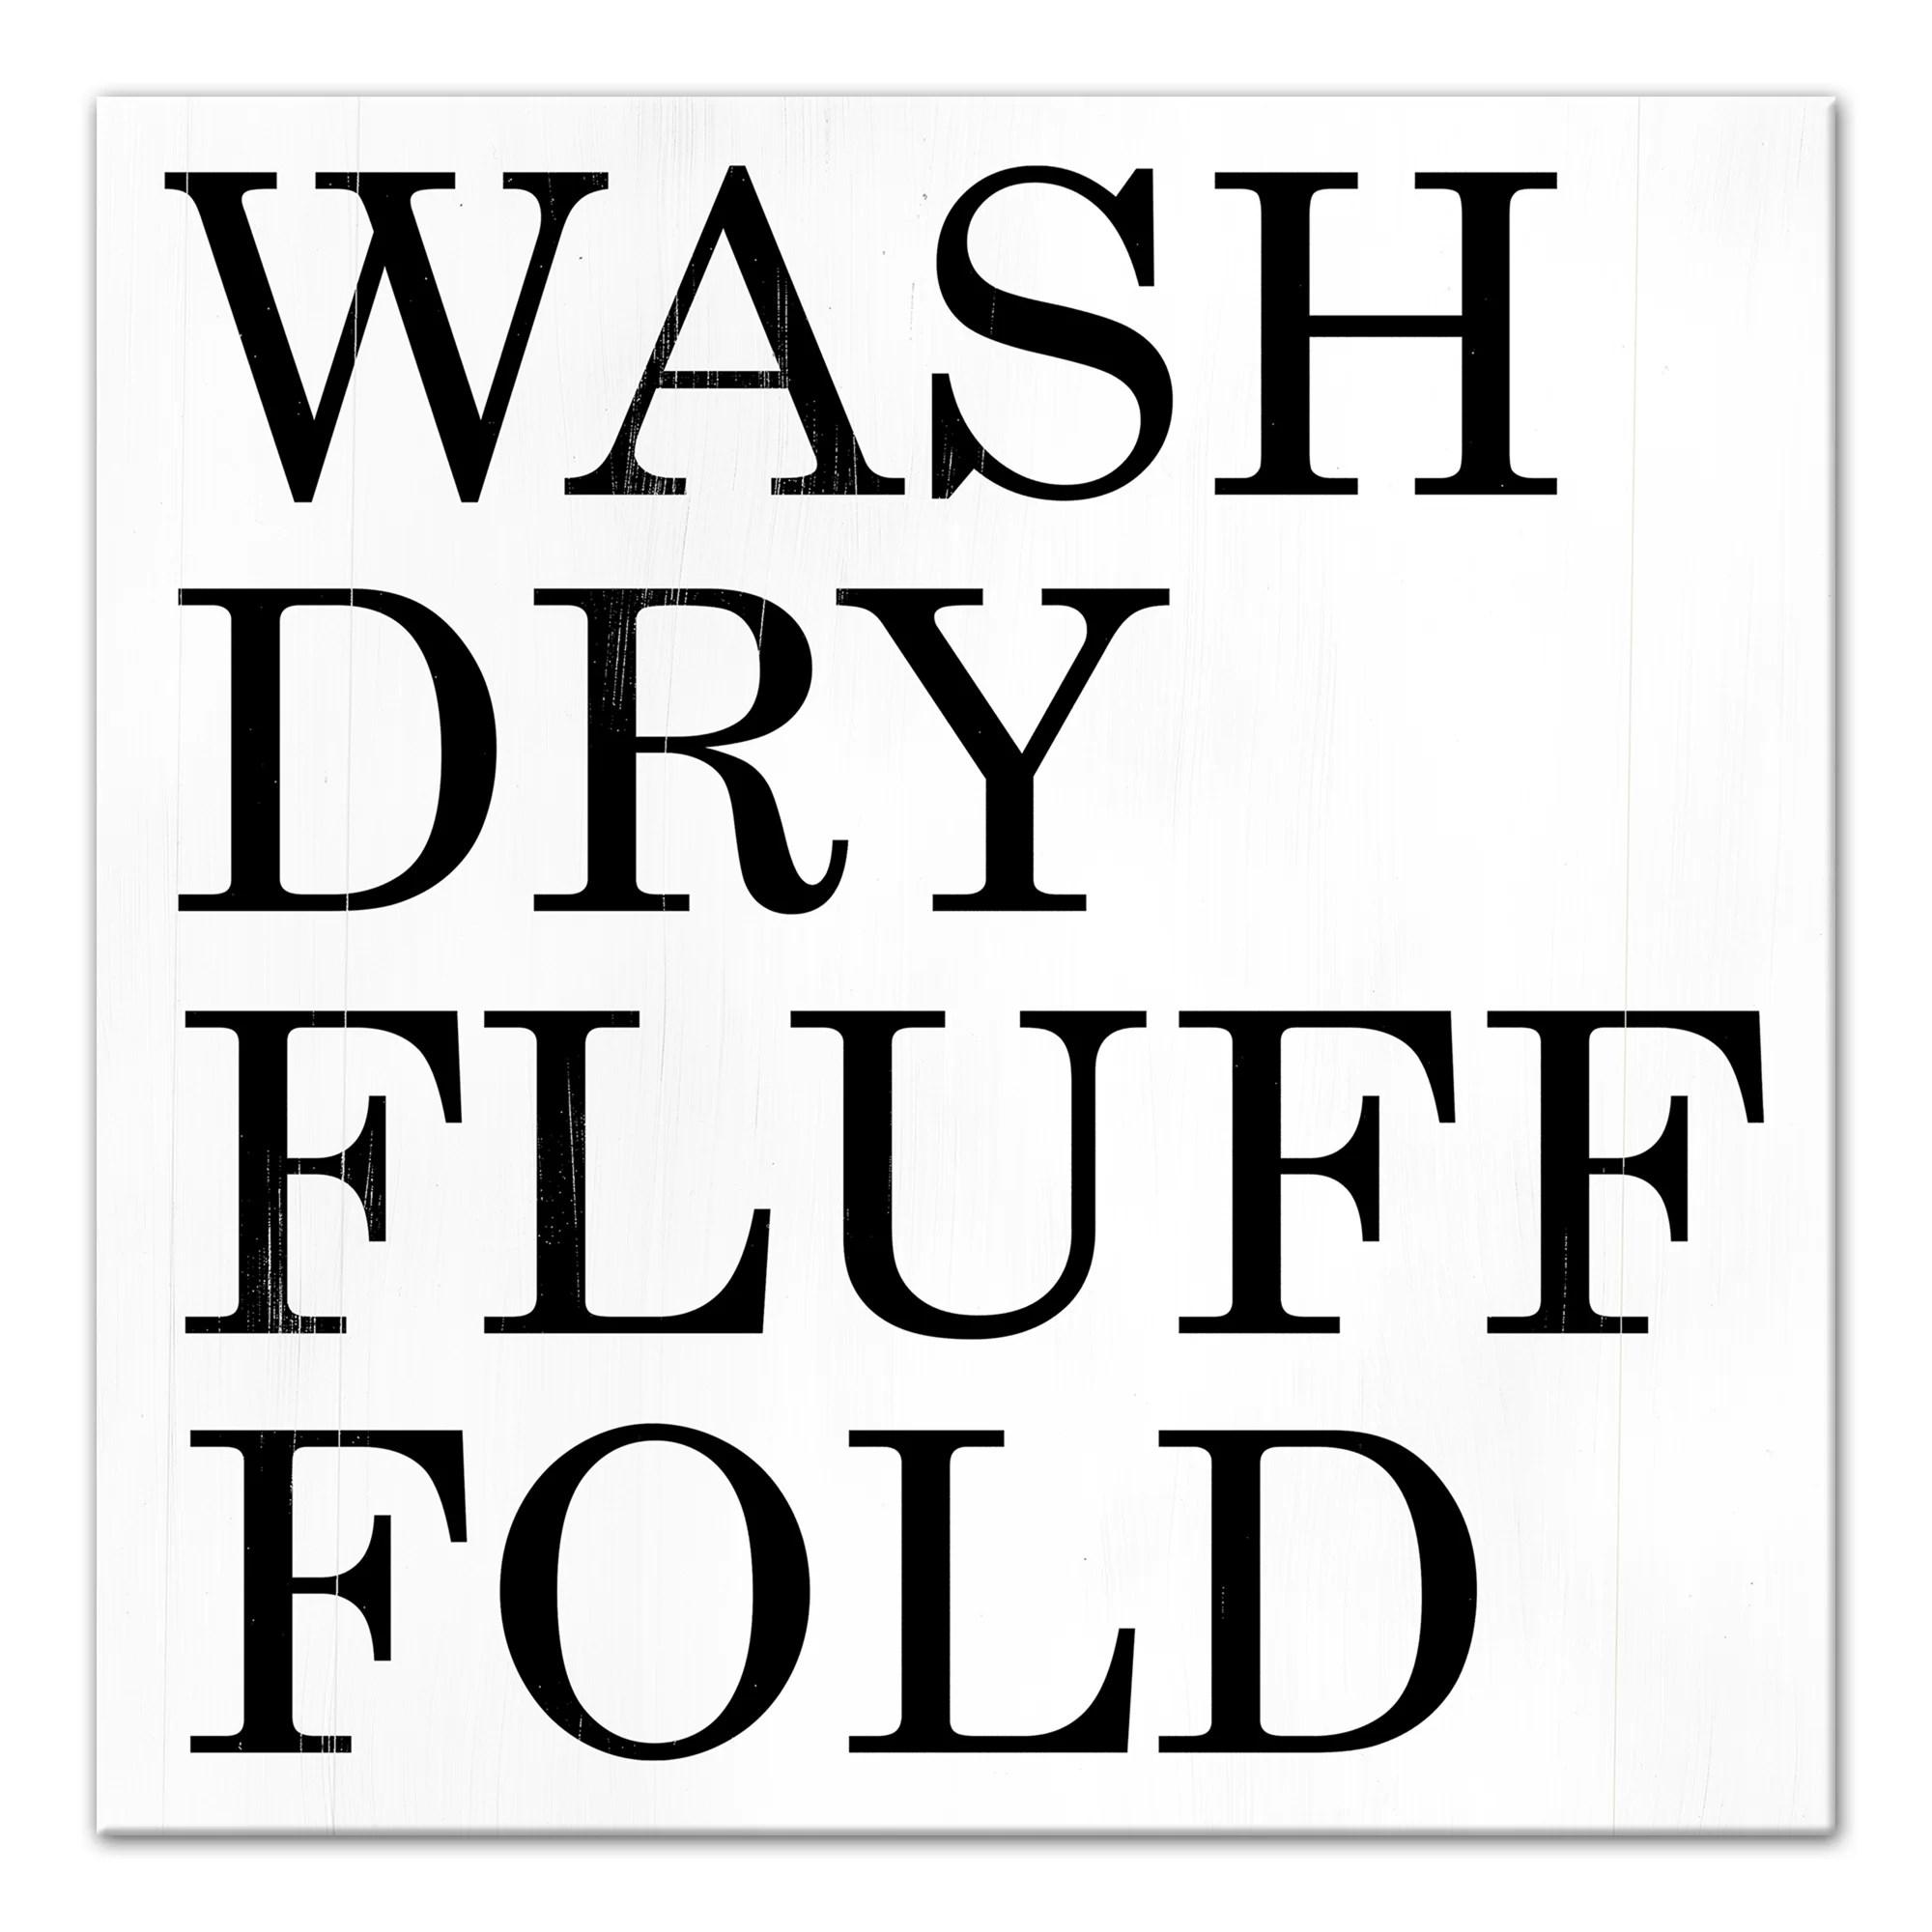 Jaxn Wash Dry Fluff Fold Framed Textual Art On Canvas